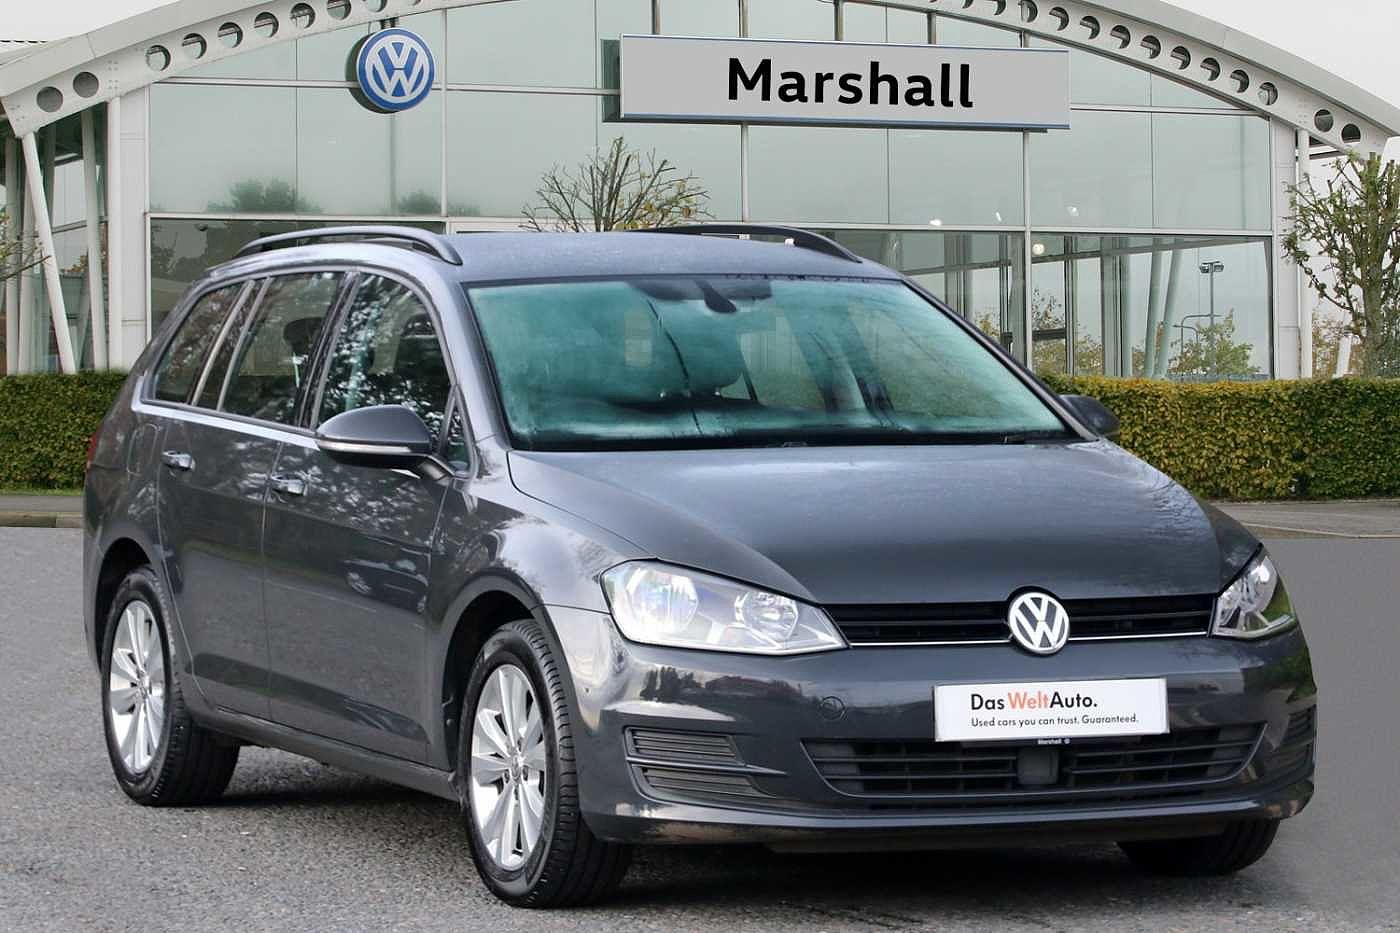 2017 Volkswagen Golf 1.6TDI SE (110ps) (BMT)(s/s) Estate 5d (17 reg)